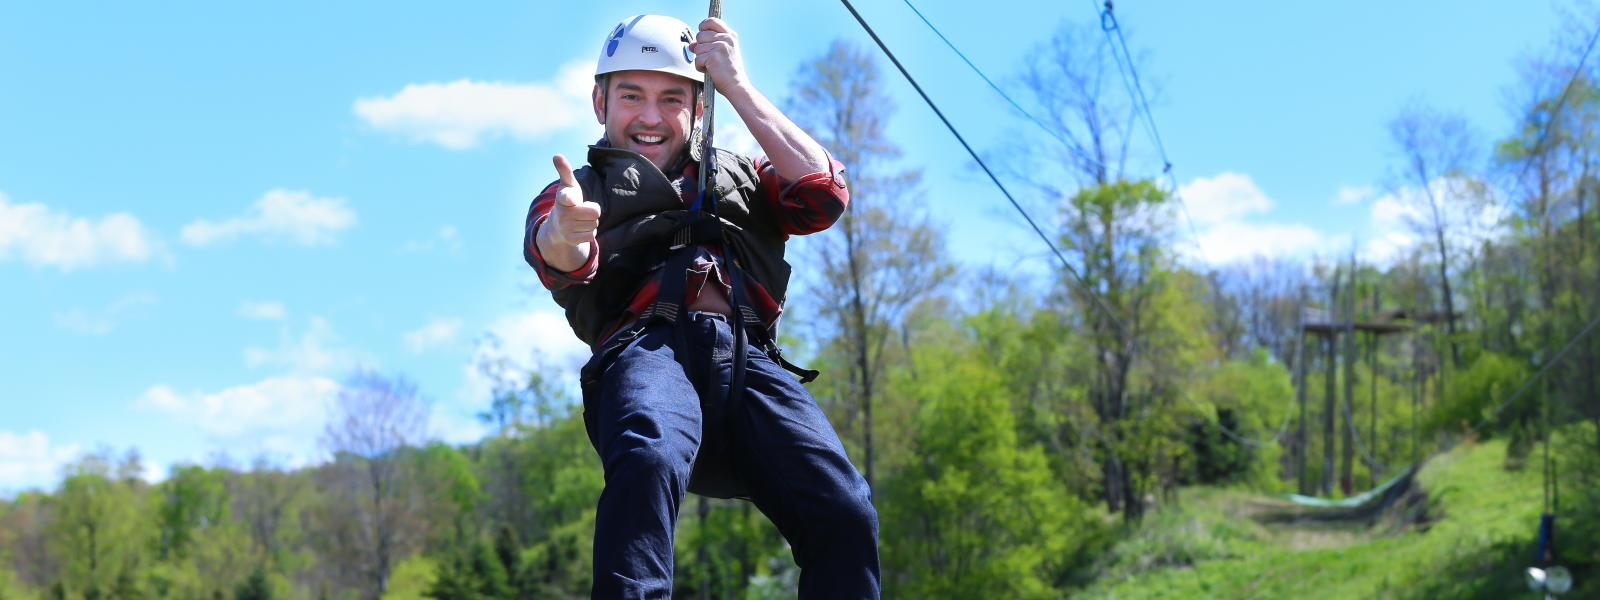 Ziplining Tours & Adventure Courses in Laurel Highlands, PA